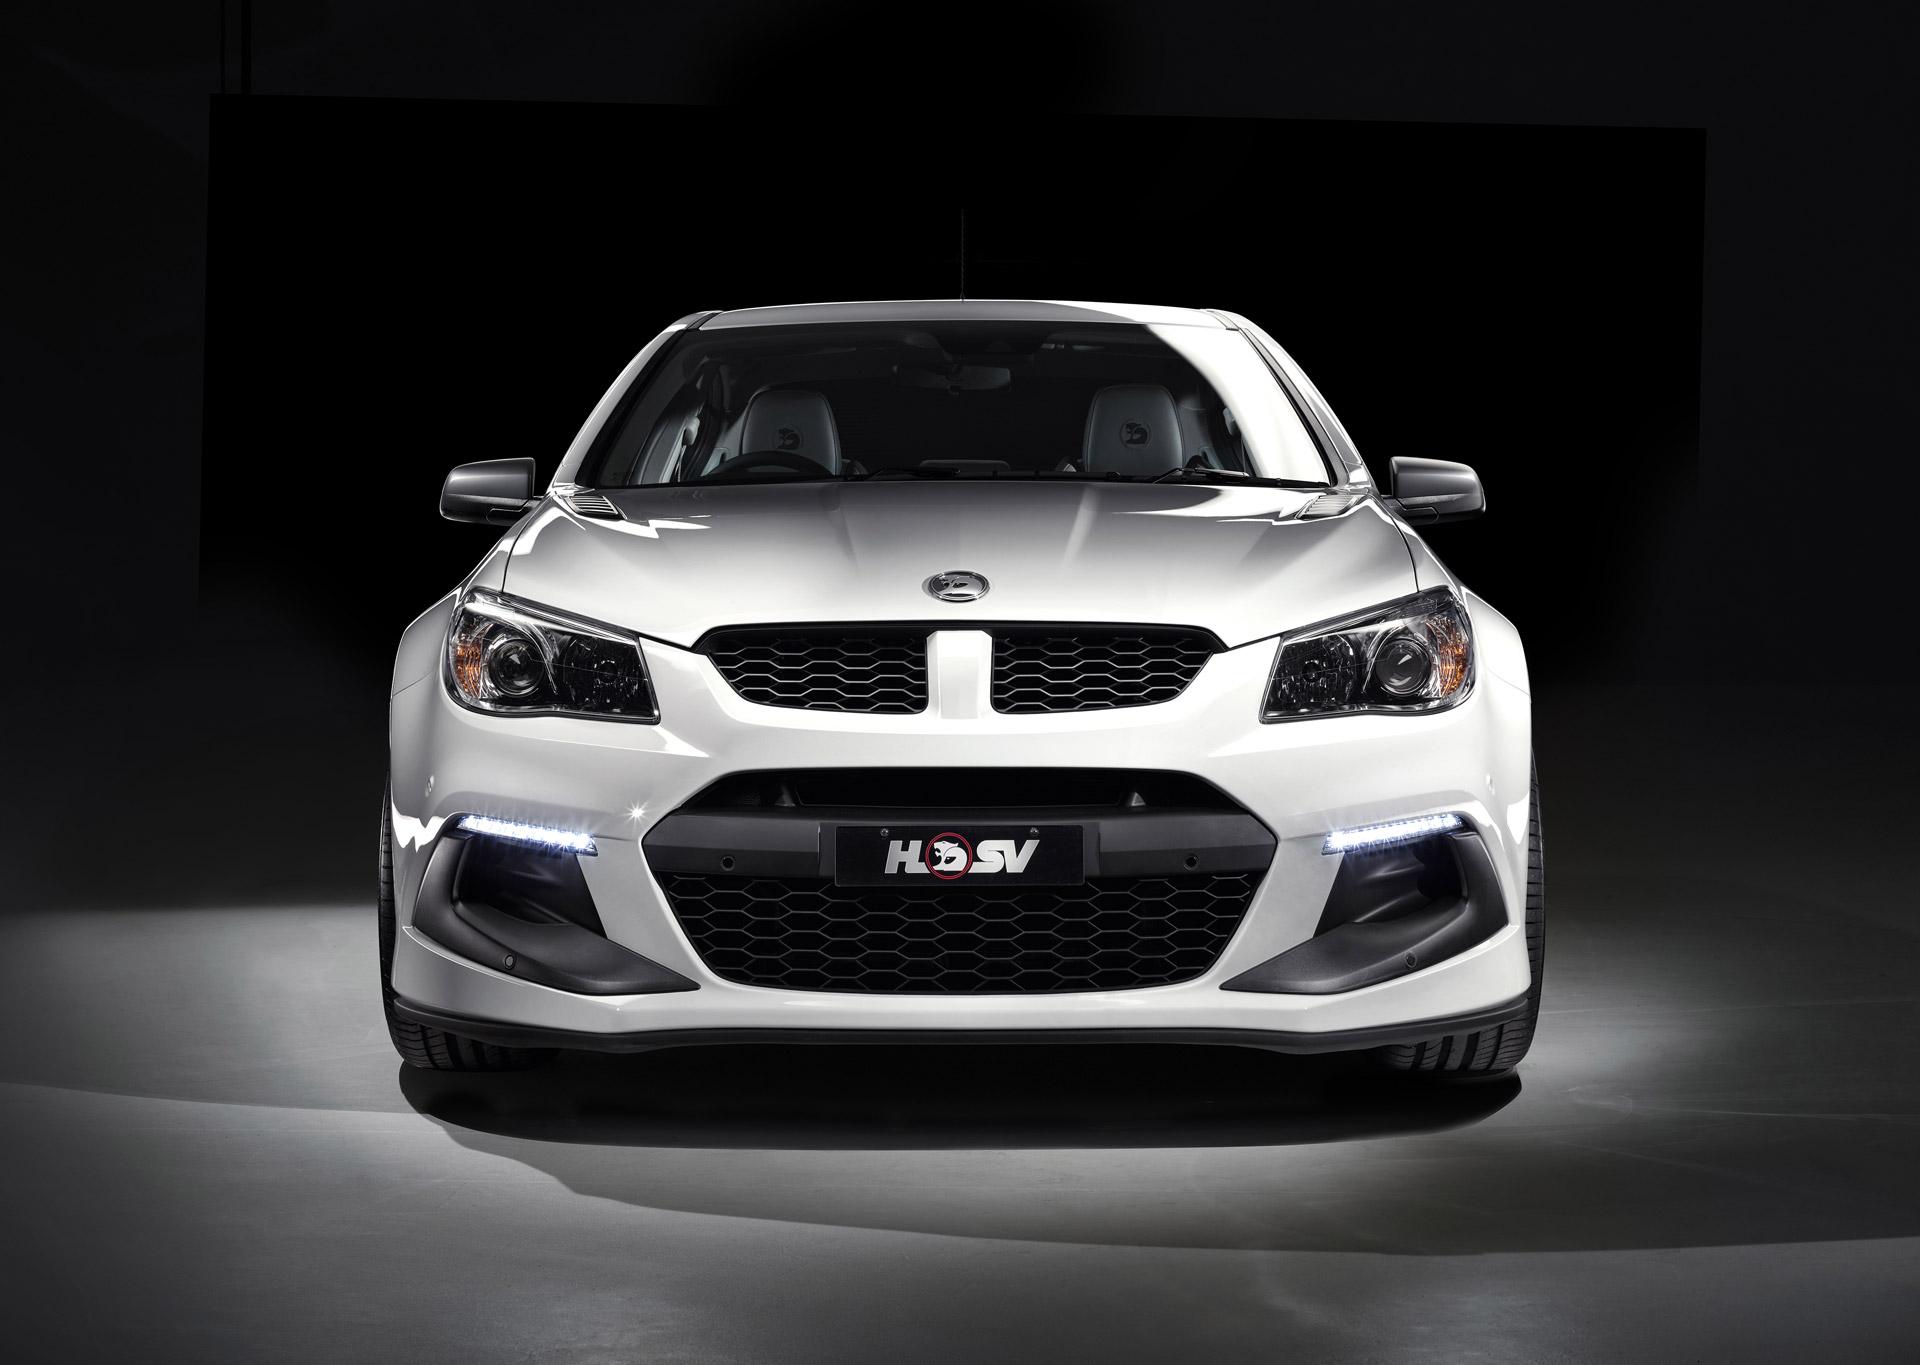 Holden Tuner Hsv Offers Supercharged Lsa V 8 On Most Models